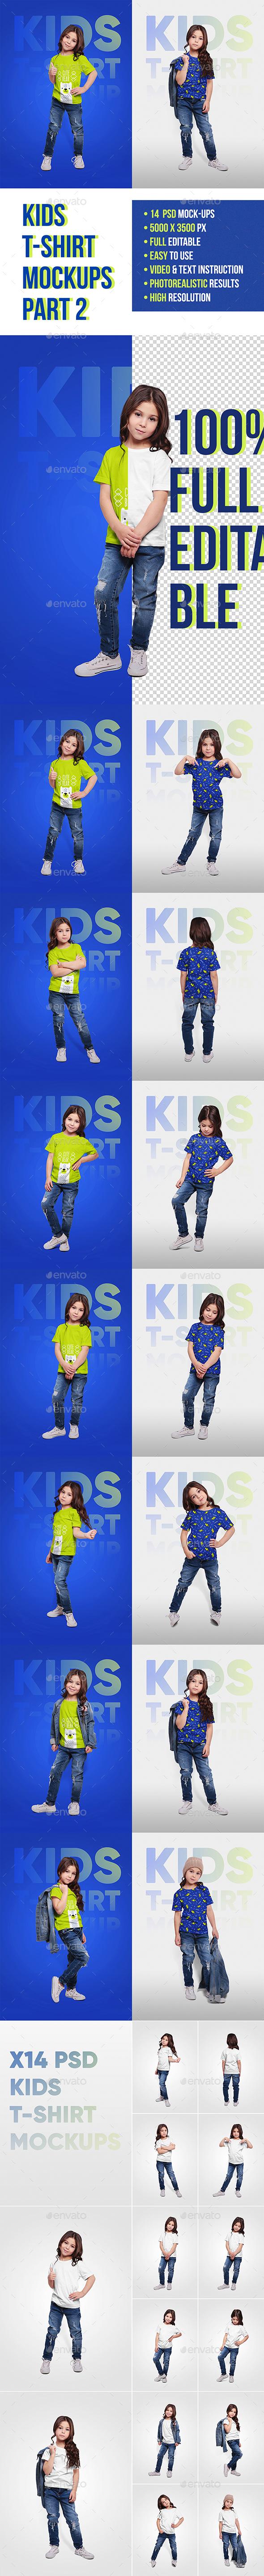 Kids T-Shirt Mockups. Part 2 - T-shirts Apparel